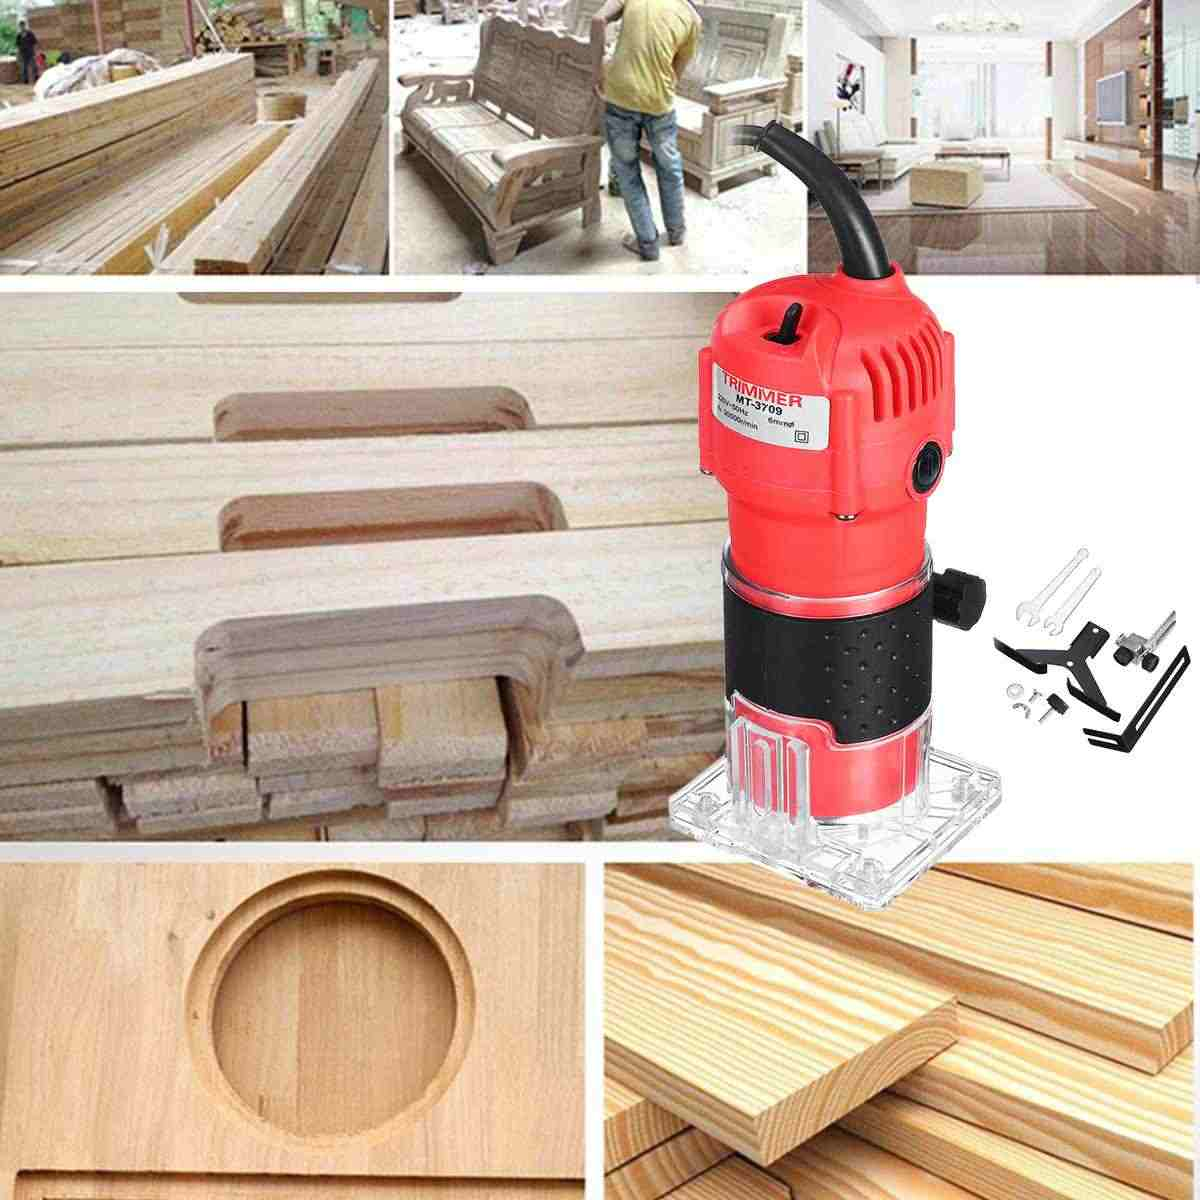 30000 RPM 220 V 110 V 1300 ワット 6.35 ミリメートル電動ハンドトリマー木材ラミネート手のひら木のルータ Joiners 手彫刻機木工ツール